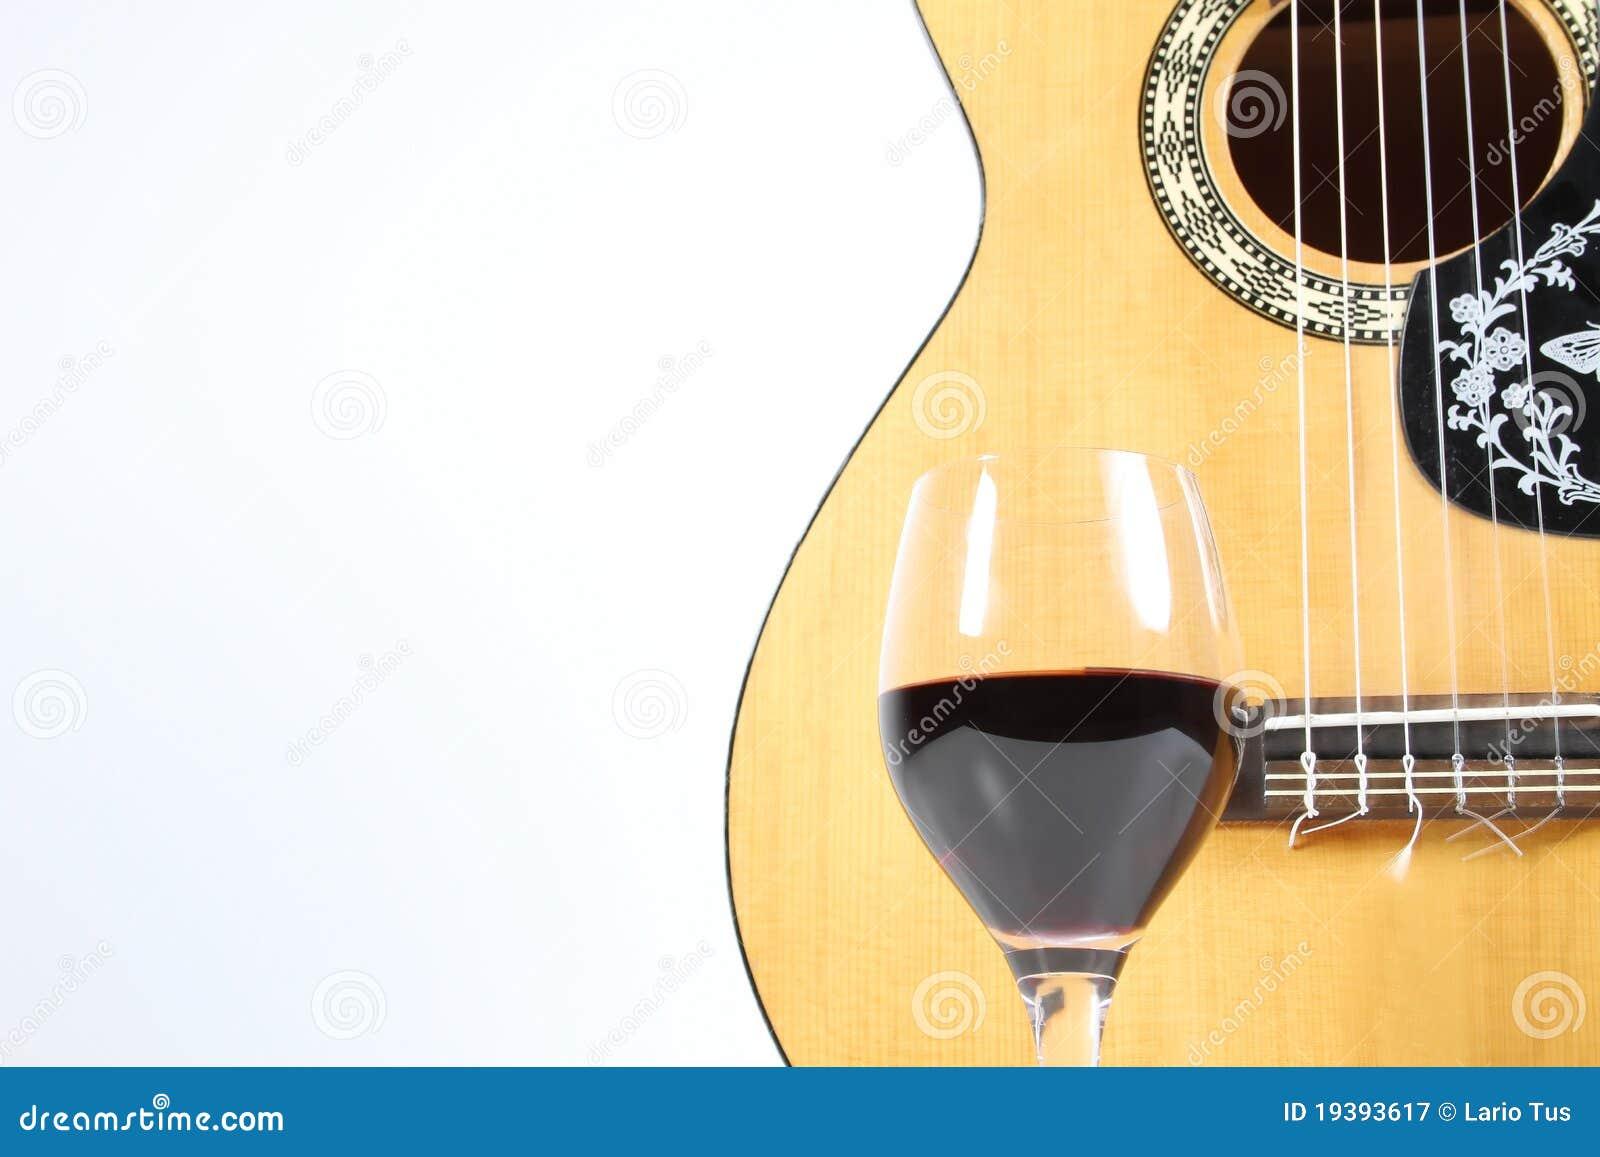 guitar wallpaper behind glass - photo #21